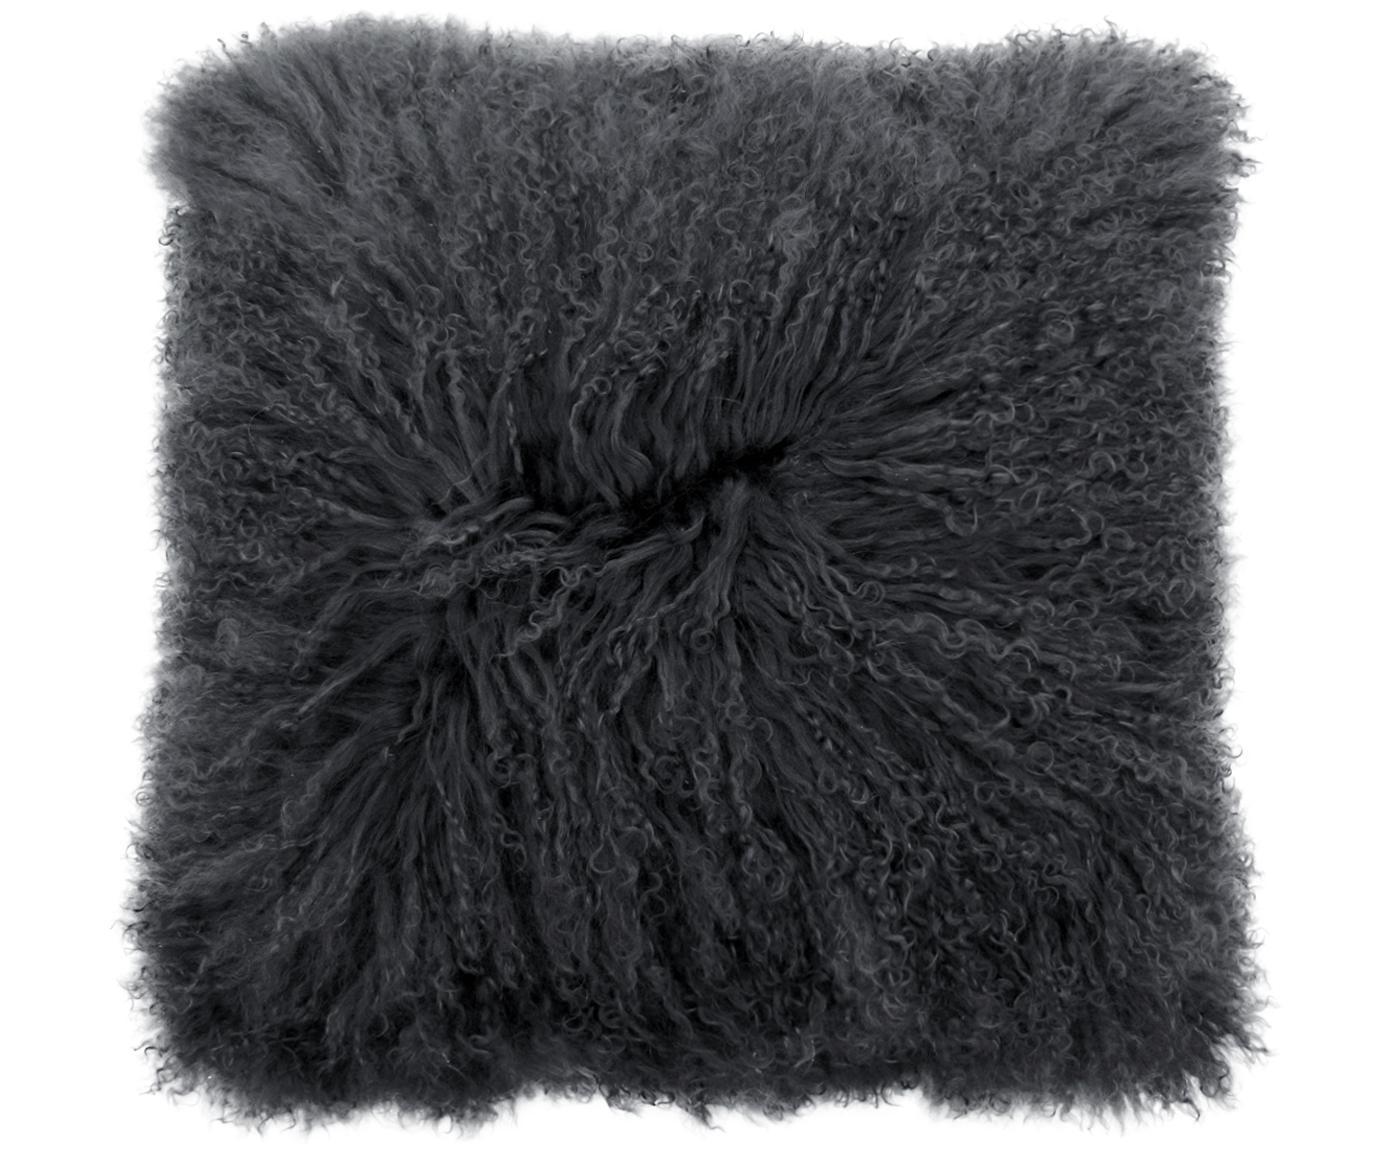 Funda de cojín en piel de cordero rizada Taera, Parte delantera: 100%piel de cordero de M, Parte trasera: 100%poliéster, Gris, An 40 x L 40 cm